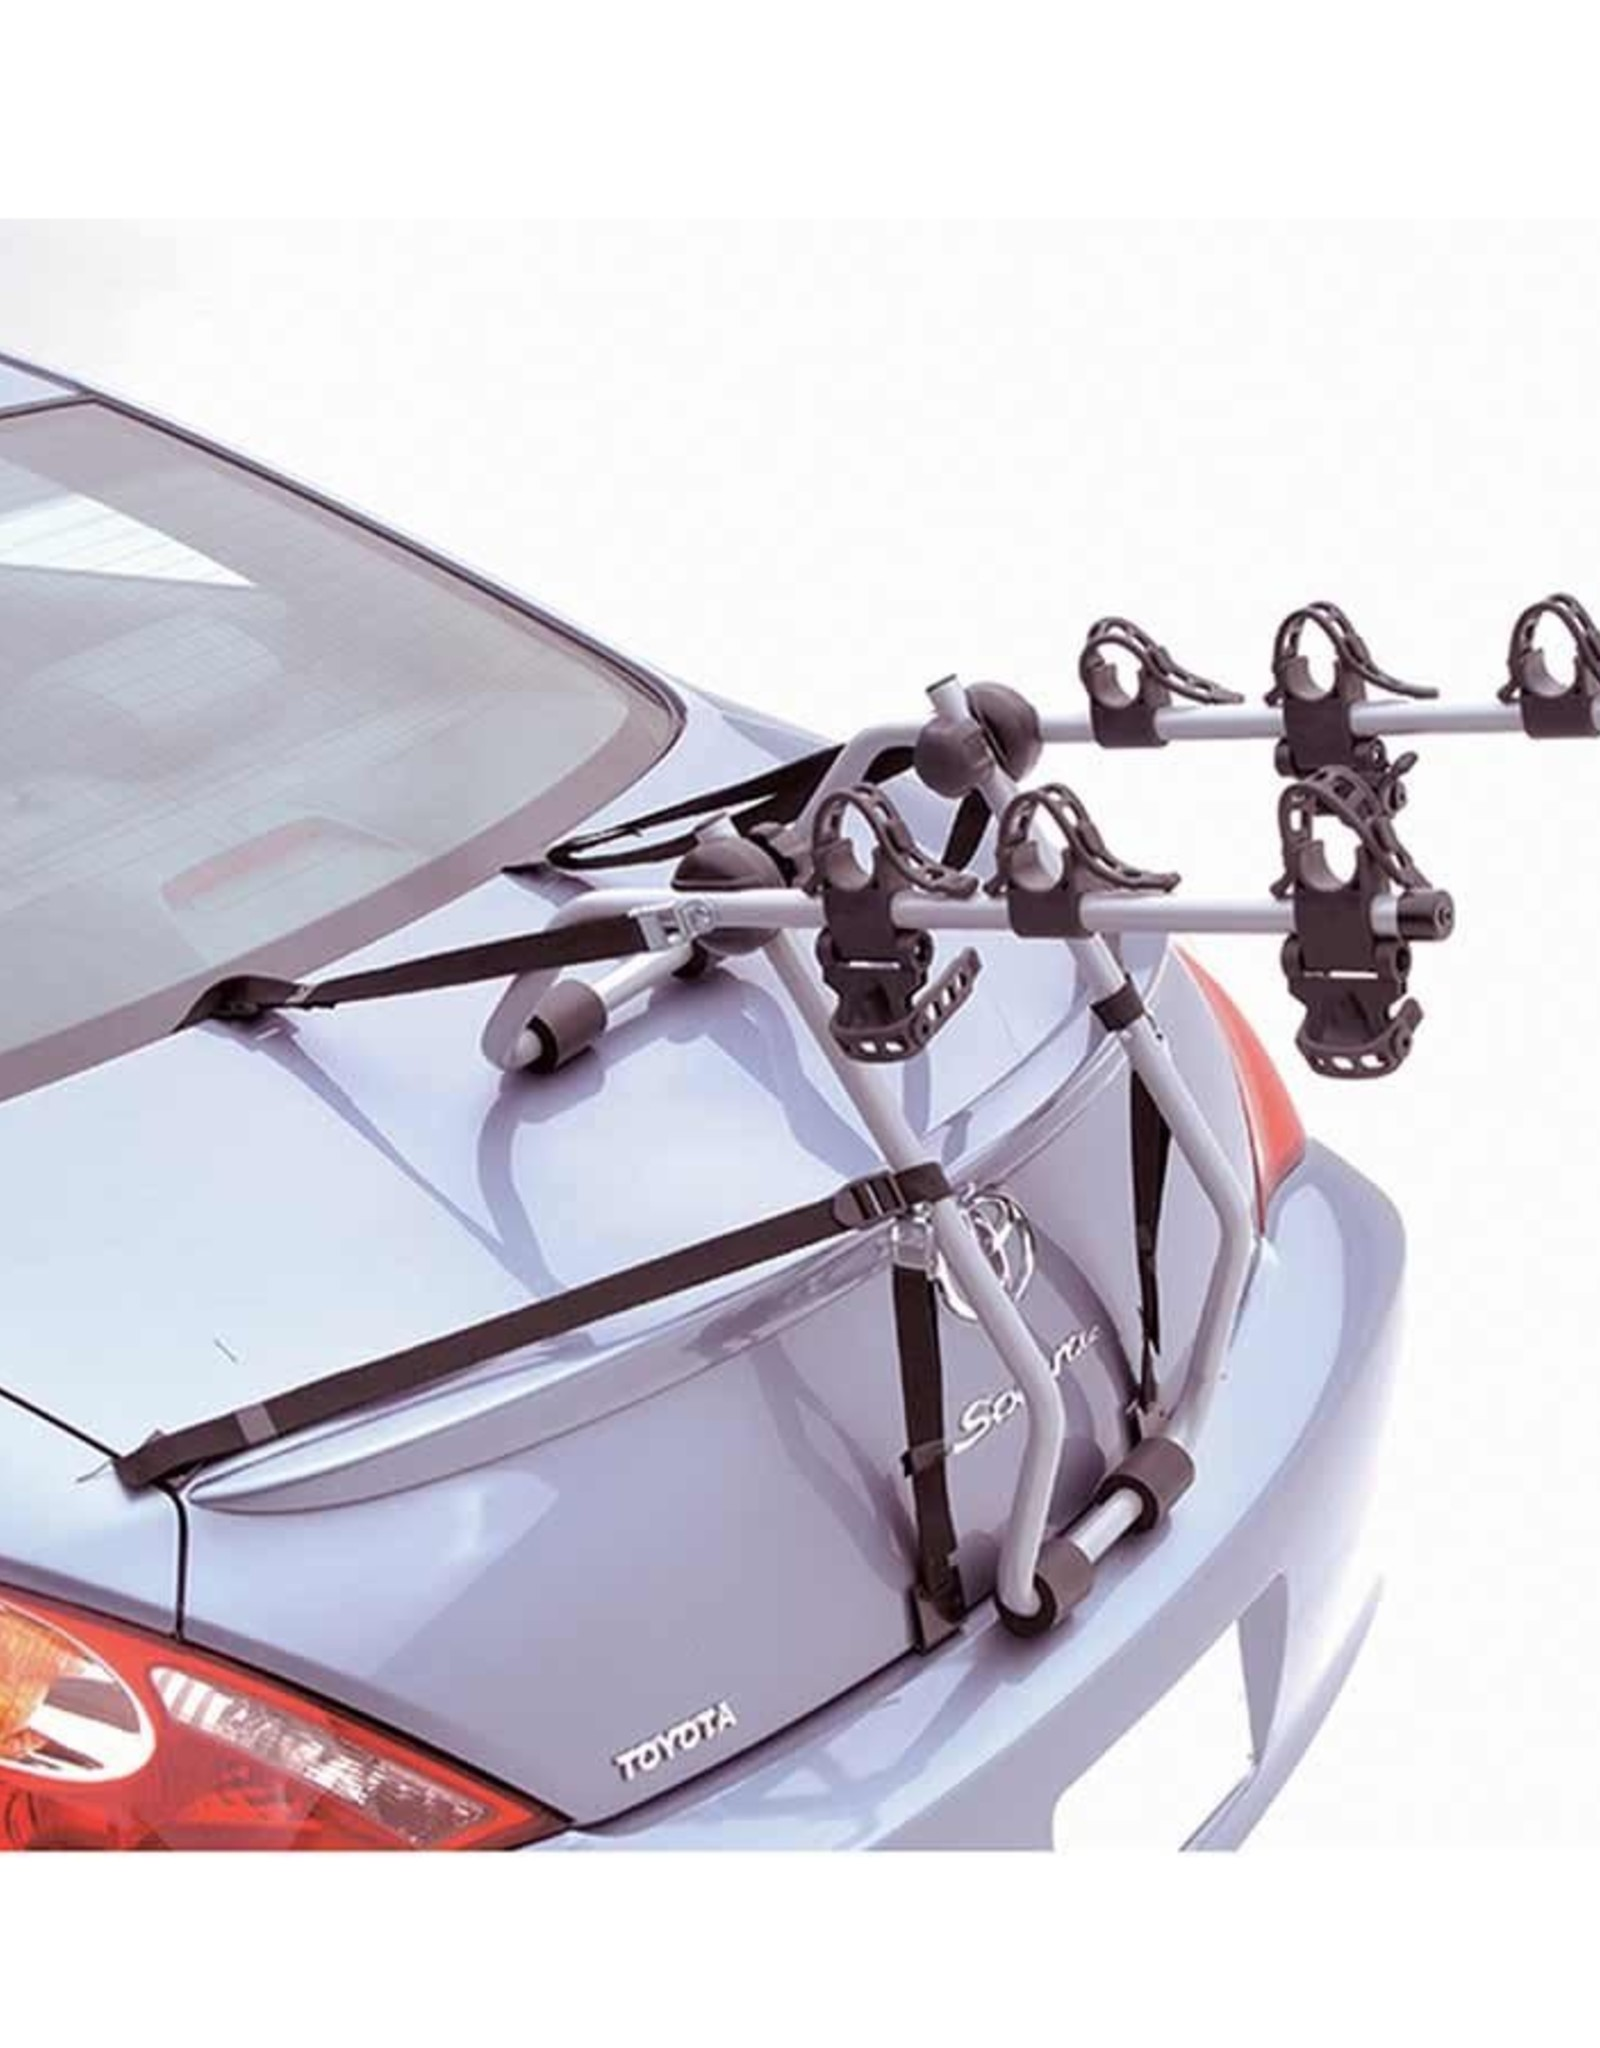 hollywood racks baja 3 bike trunk mount rack bikes 3 silver black